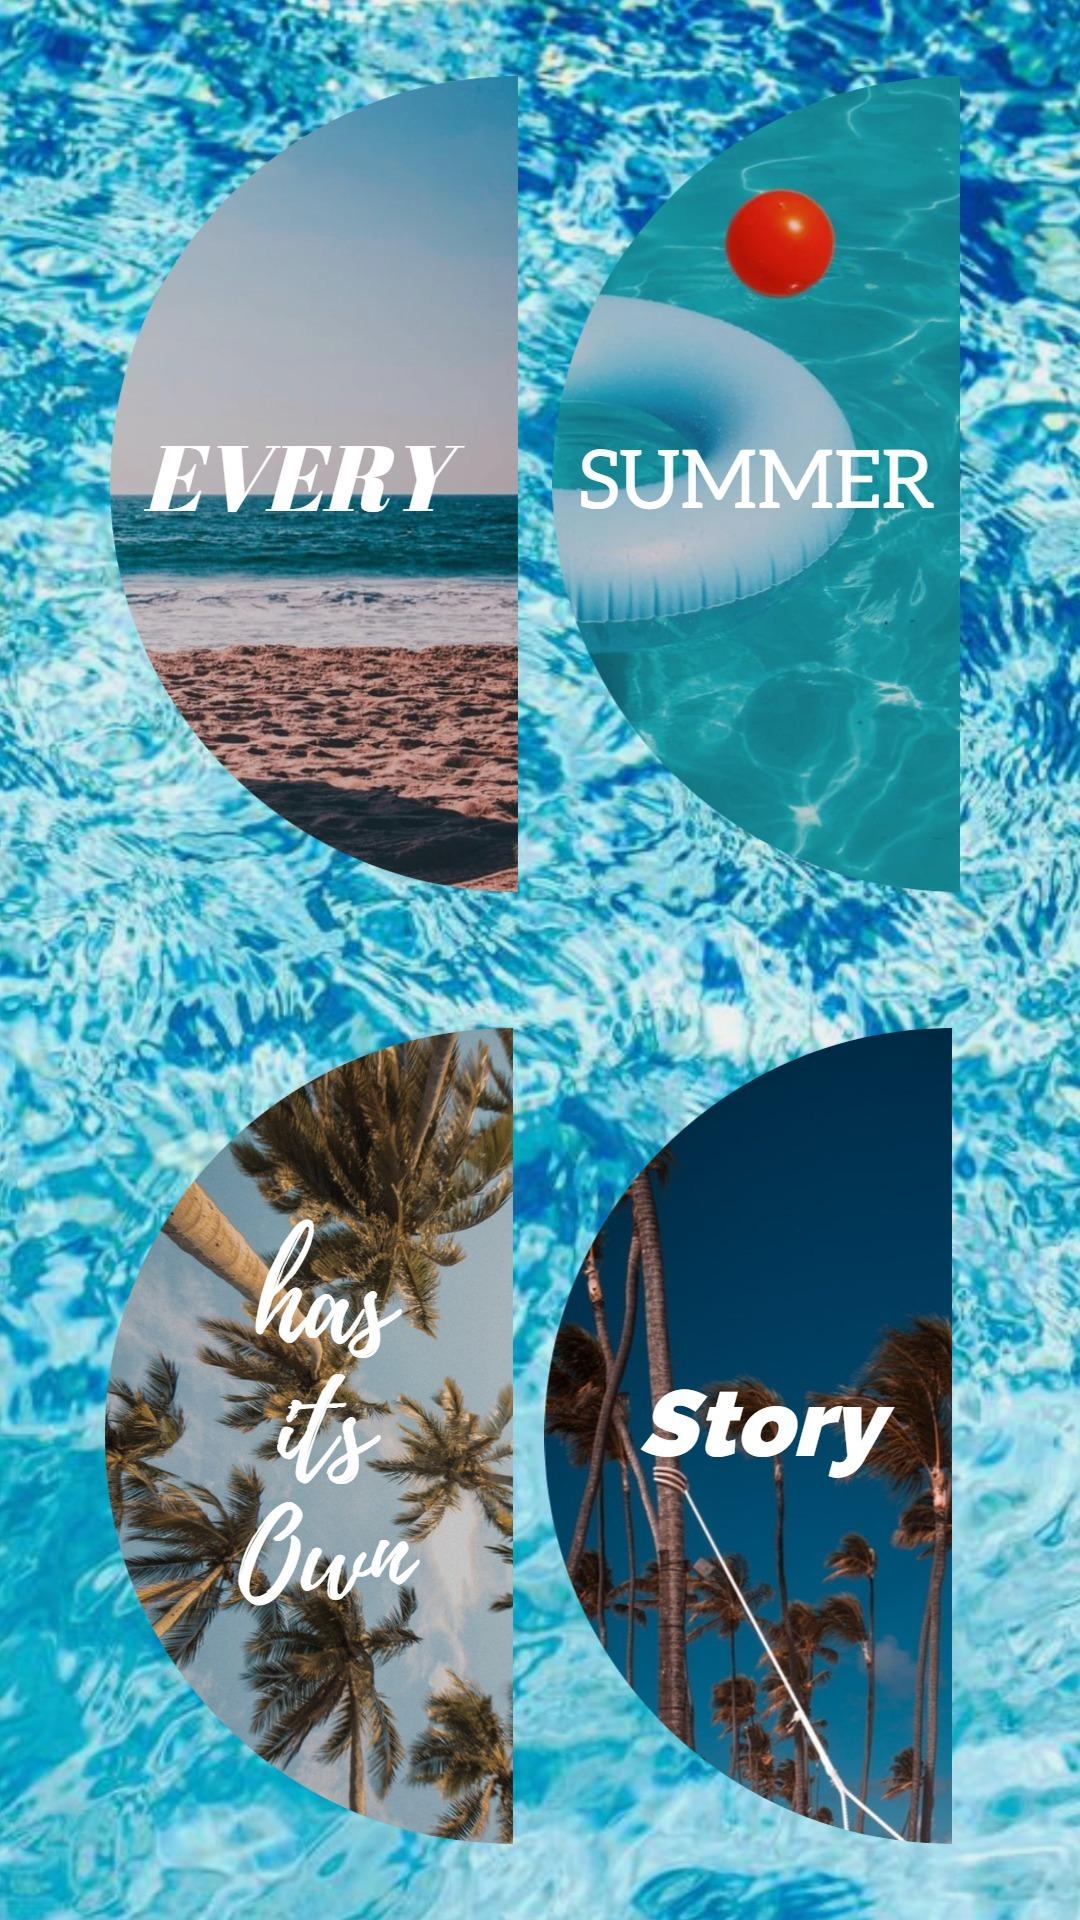 story2_wl_20190513